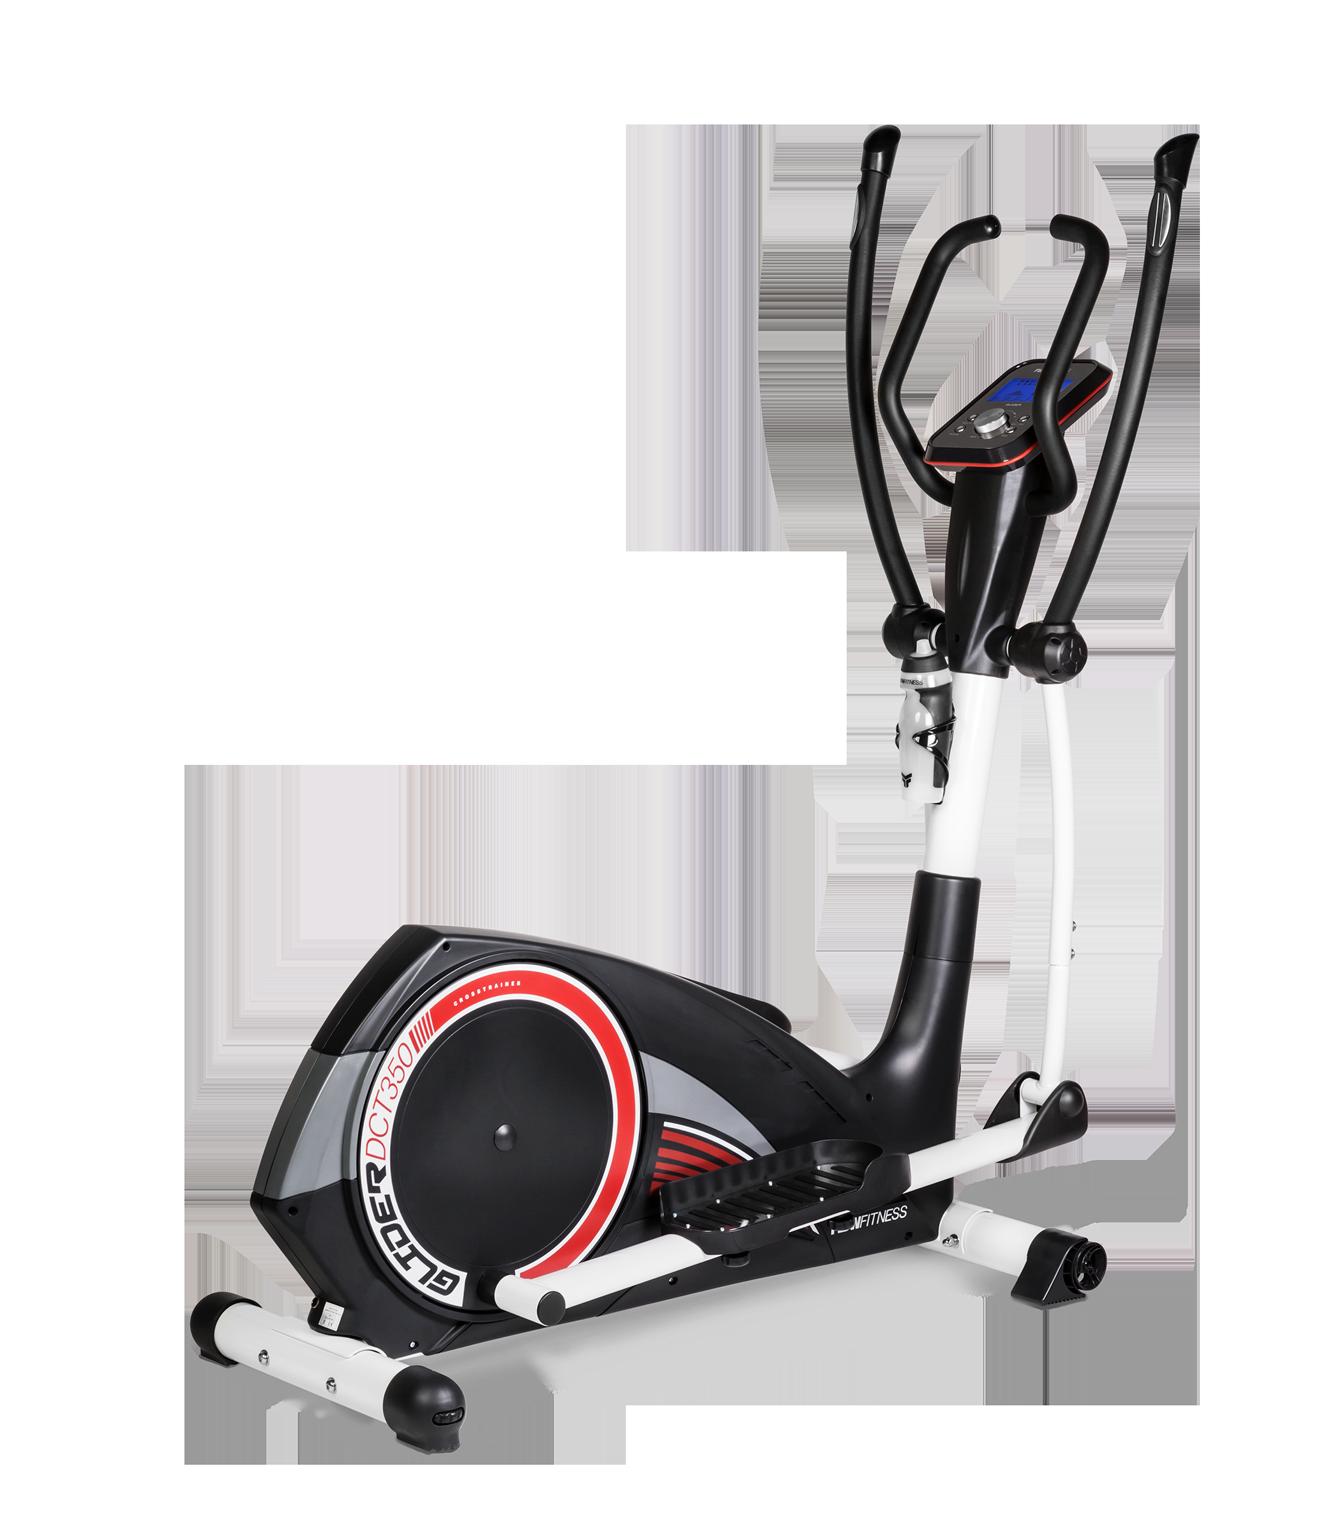 Flow Fitness Glider DCT350 Ergometer